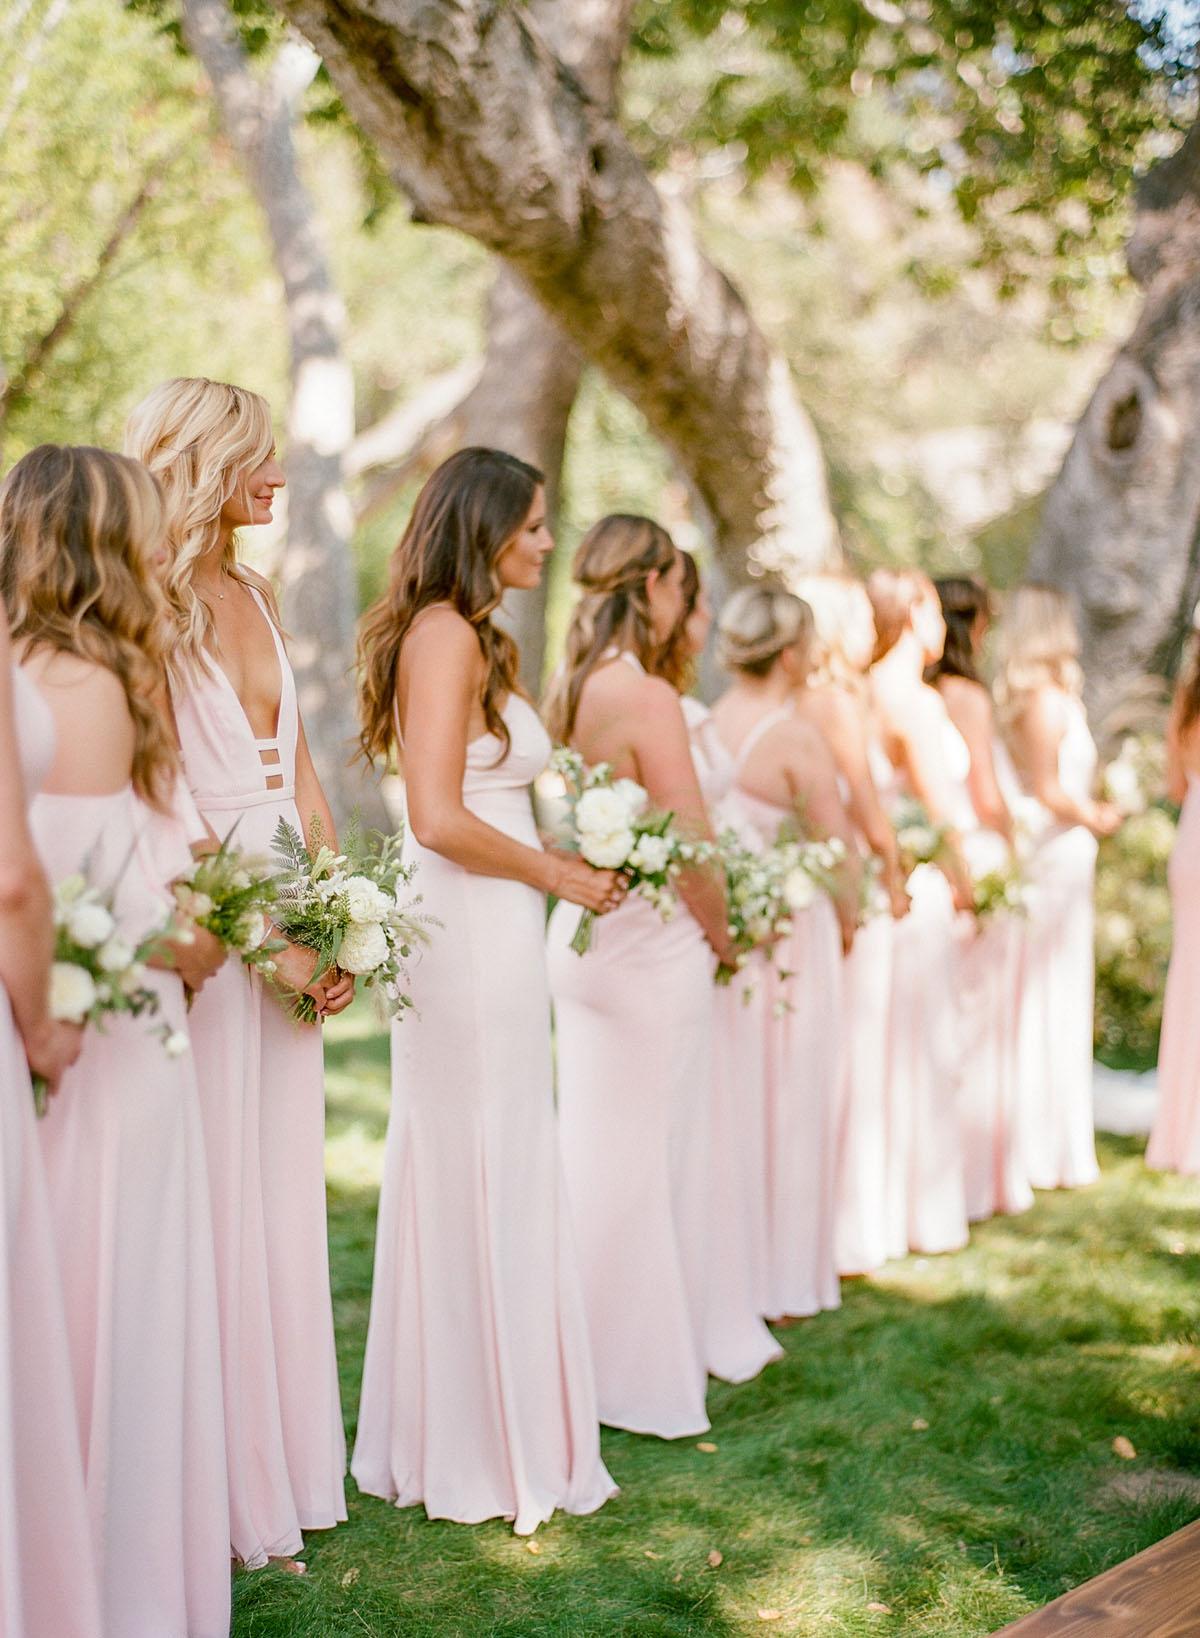 11-gardener-ranch-wedding.jpg